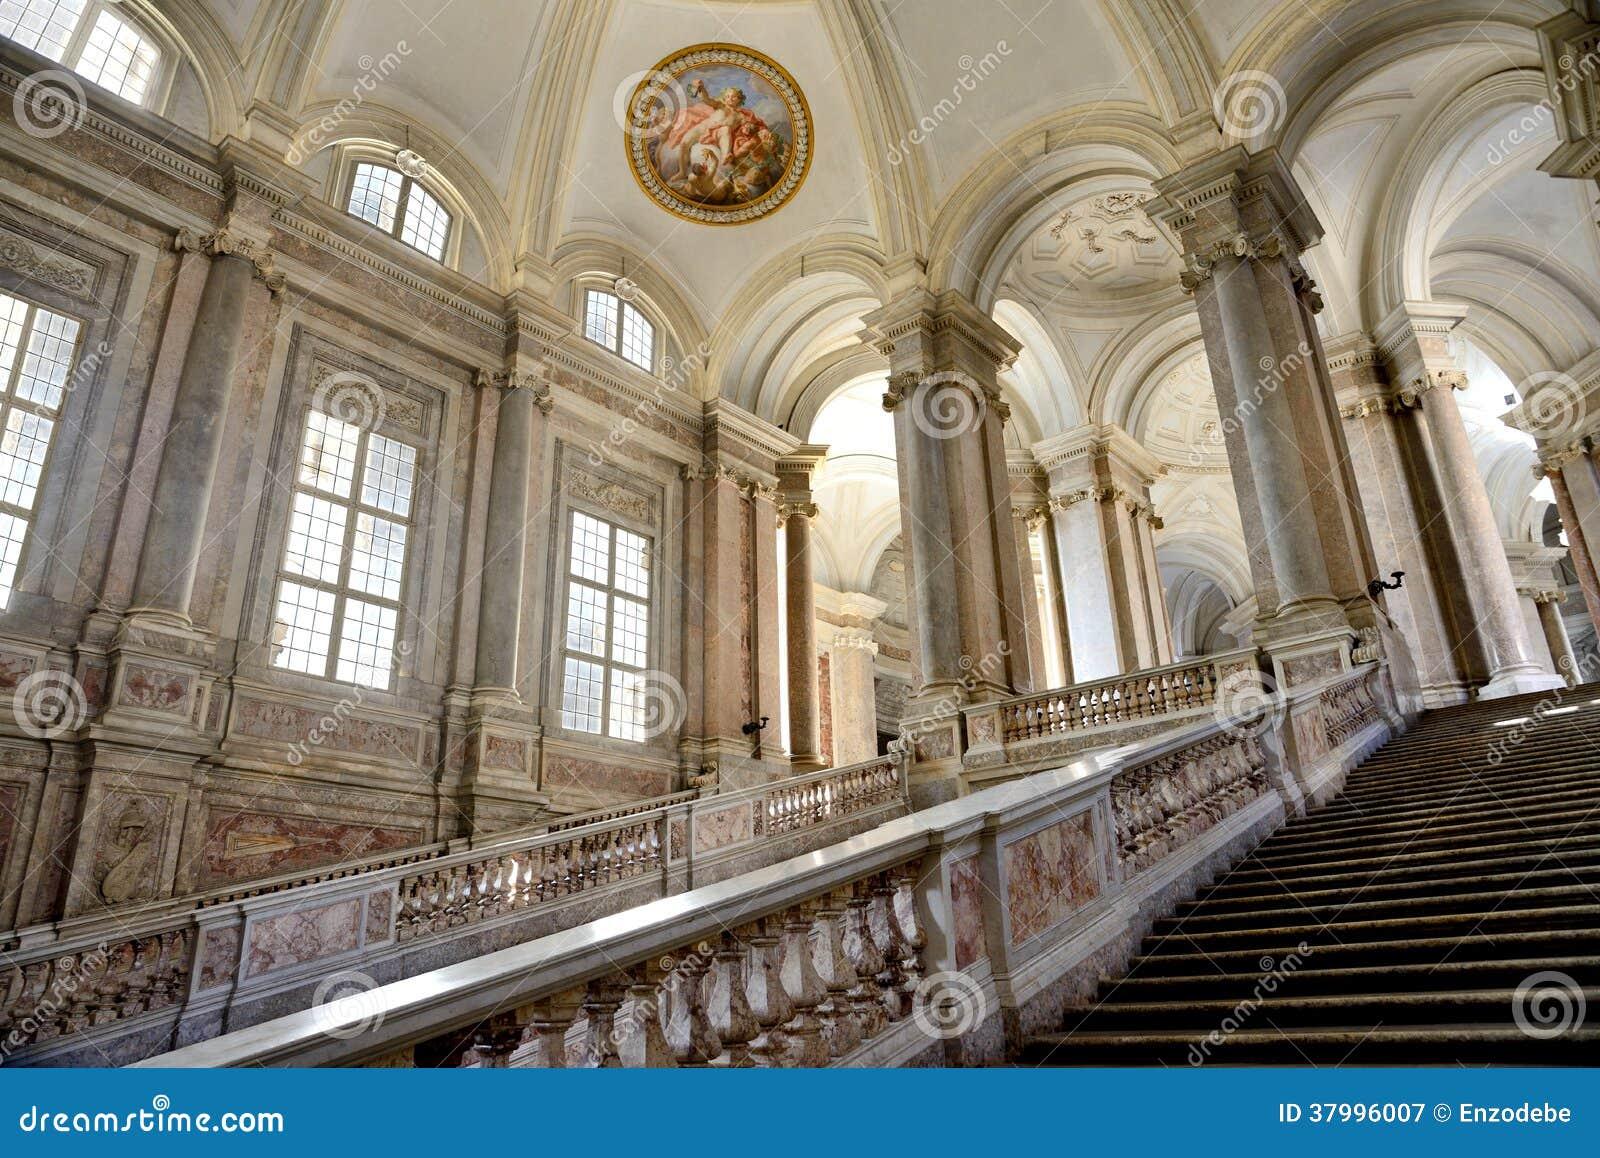 Interior of caserta palace editorial photography image 37996007 - Interior designer caserta ...